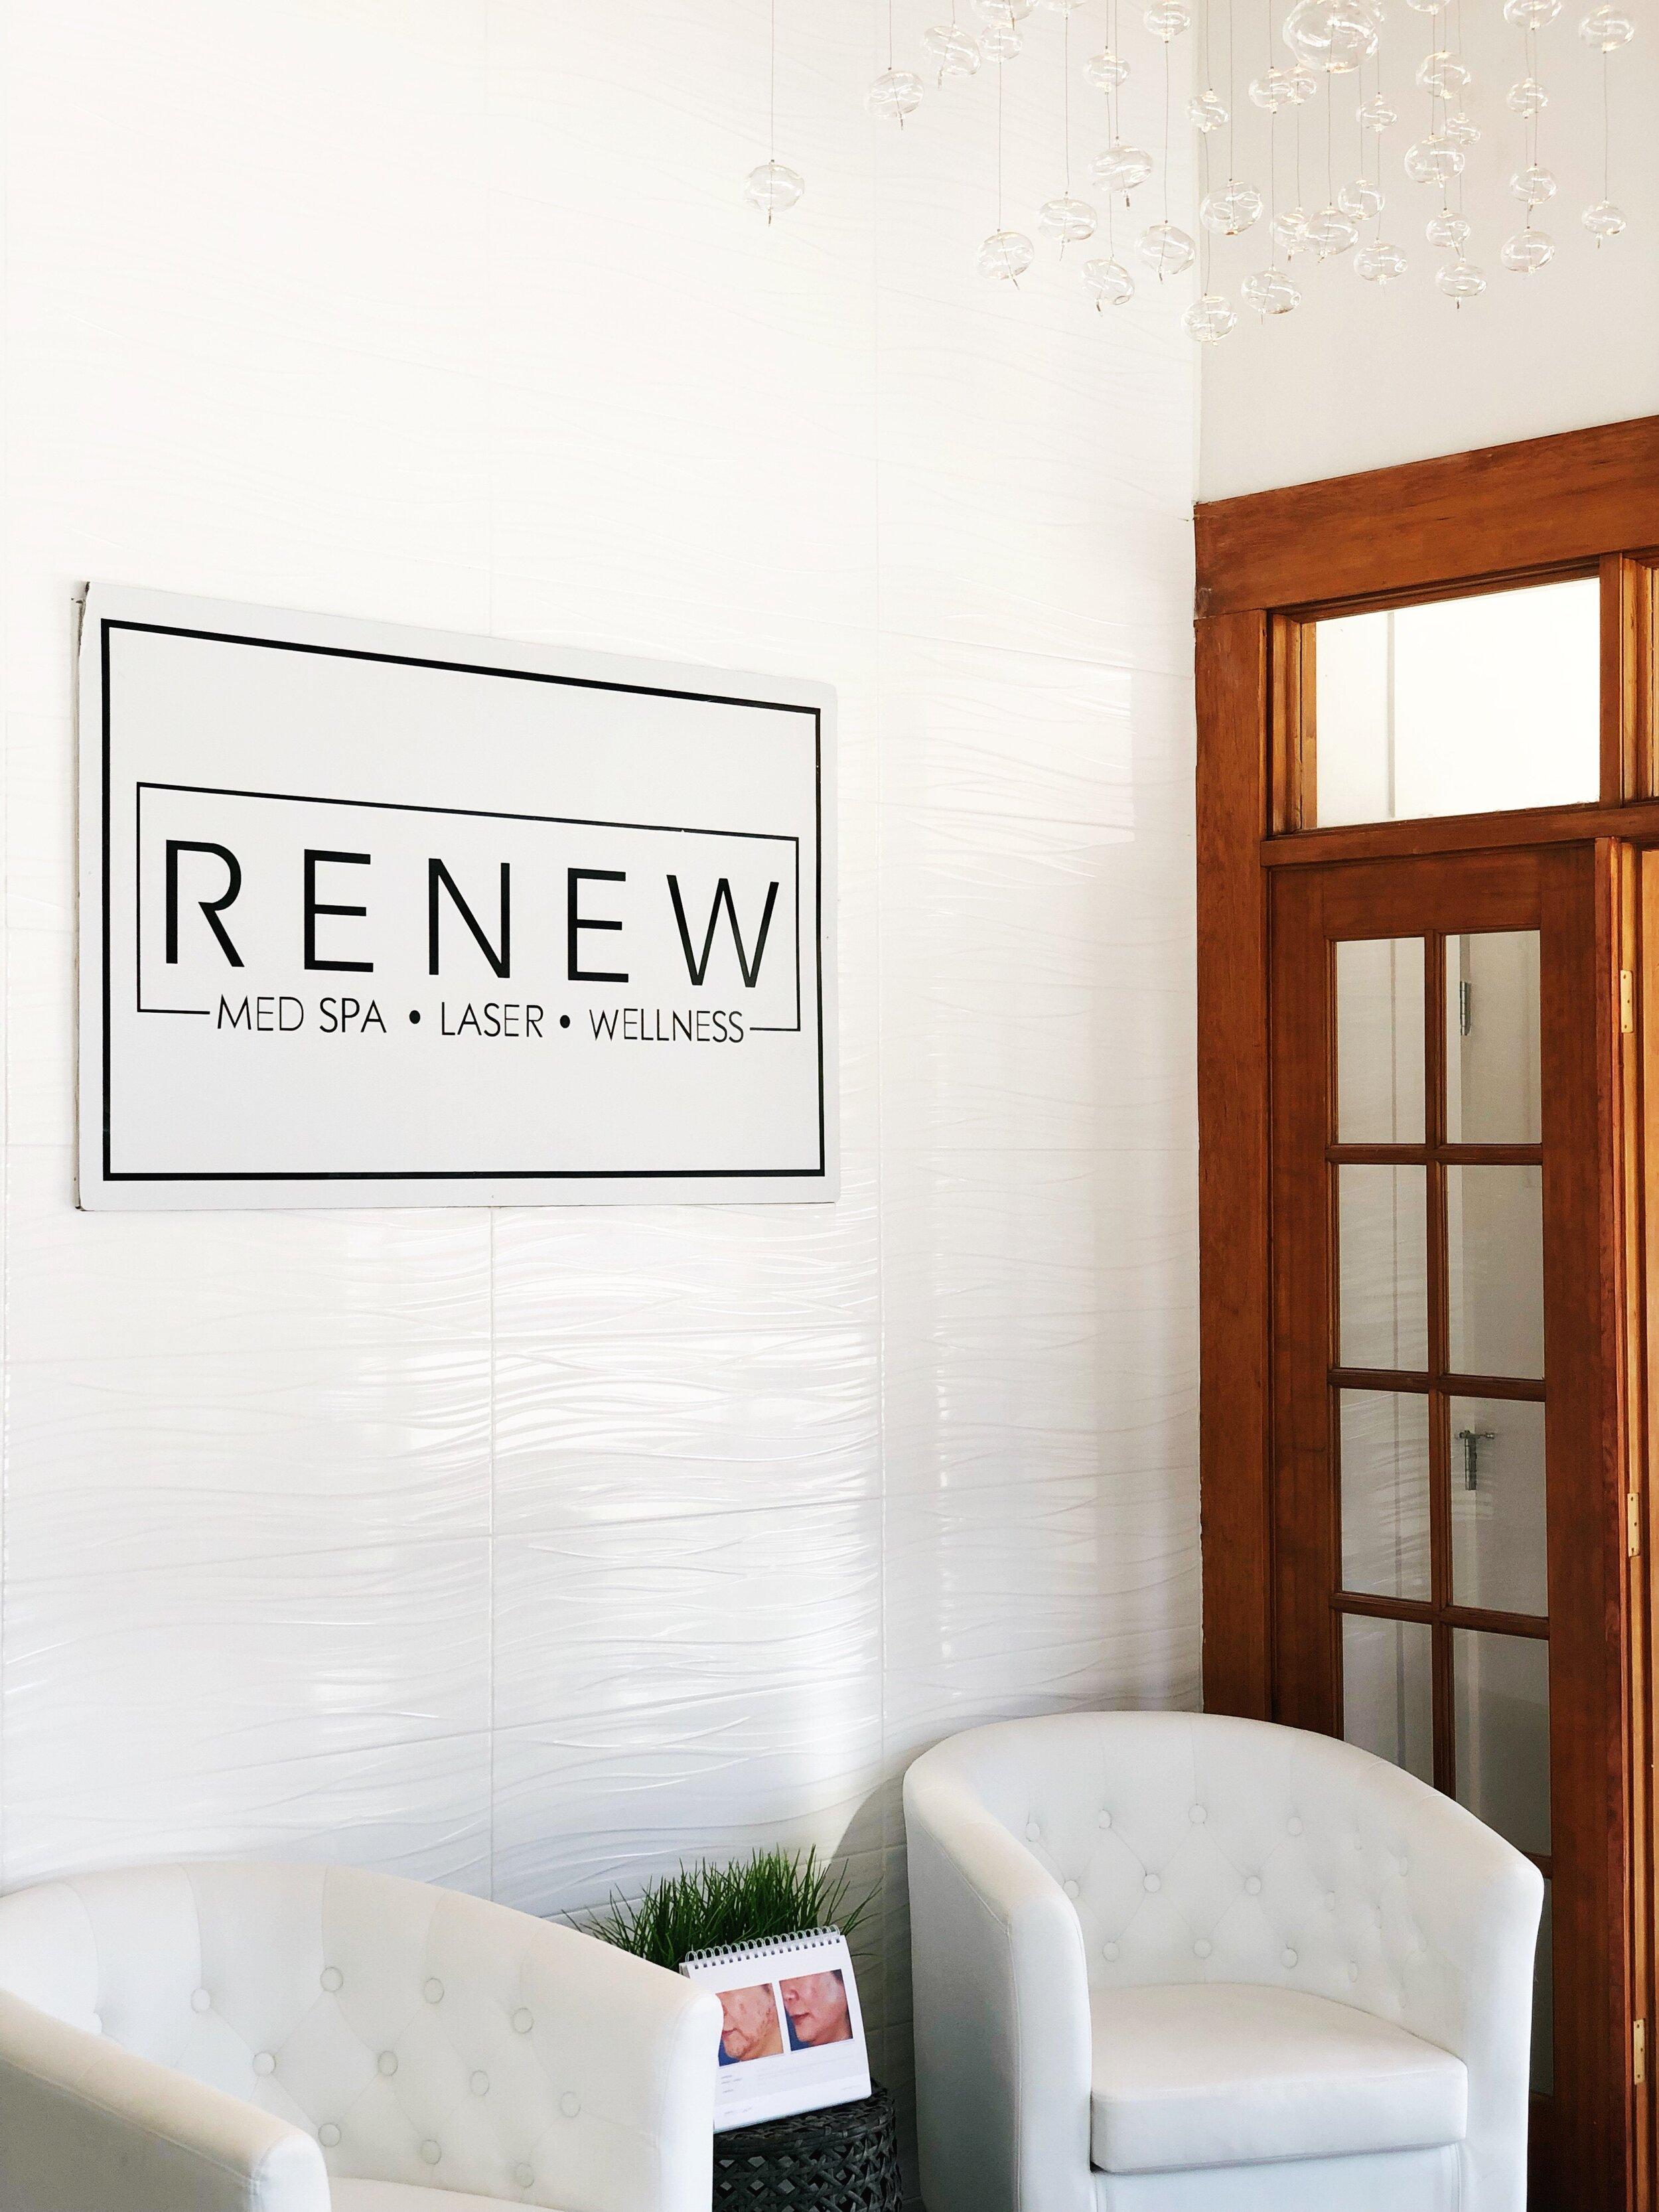 Renew Medical Spa + Laser + Wellness in Downtown Pueblo